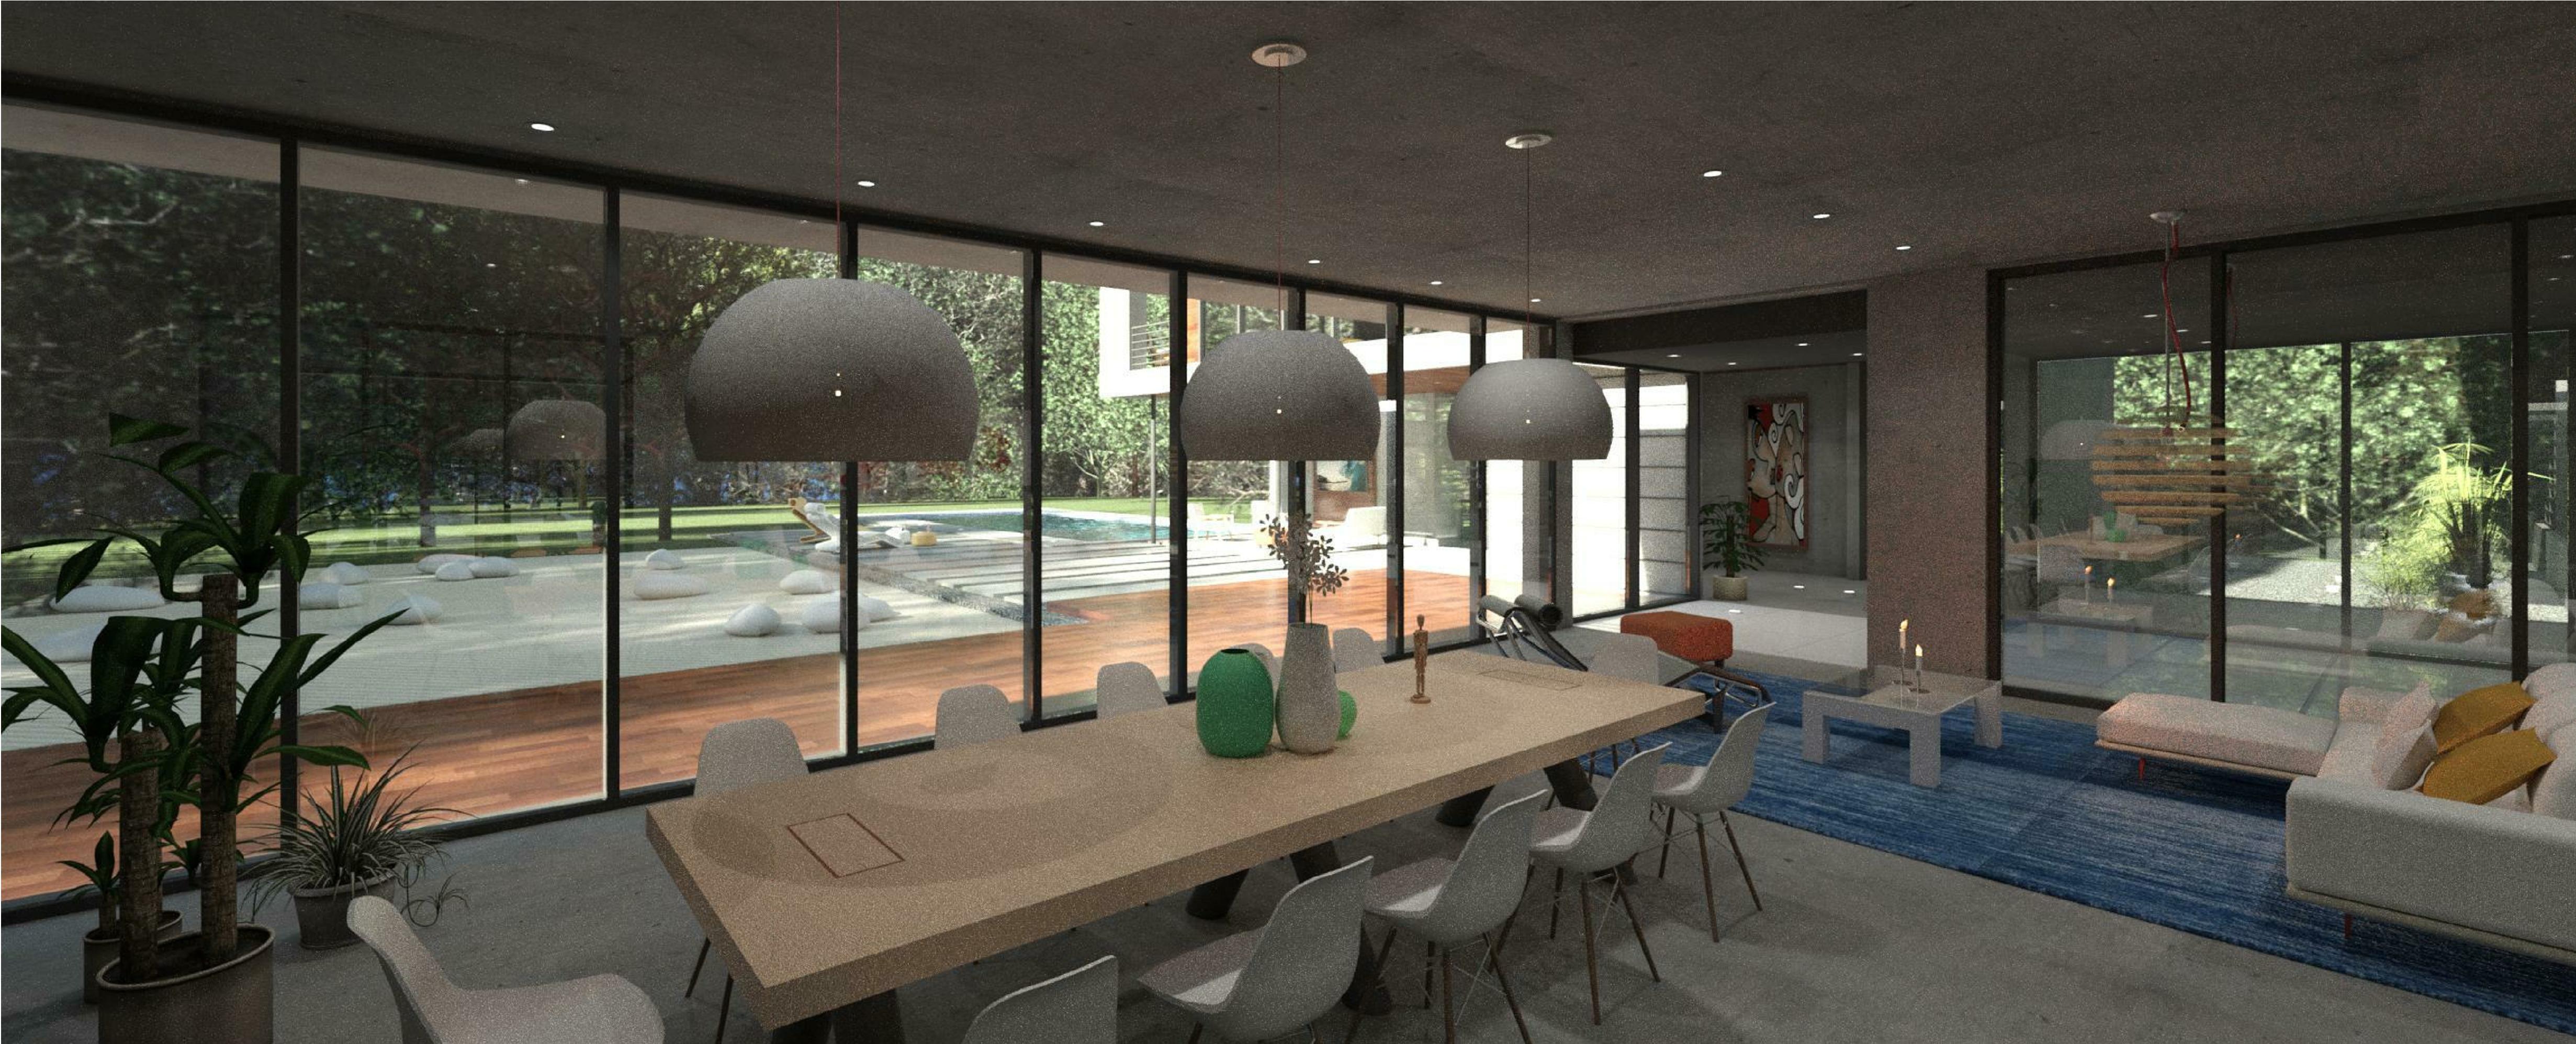 Solved Revit Or Autodesk For Interior Designers Autodesk Community Revit Products